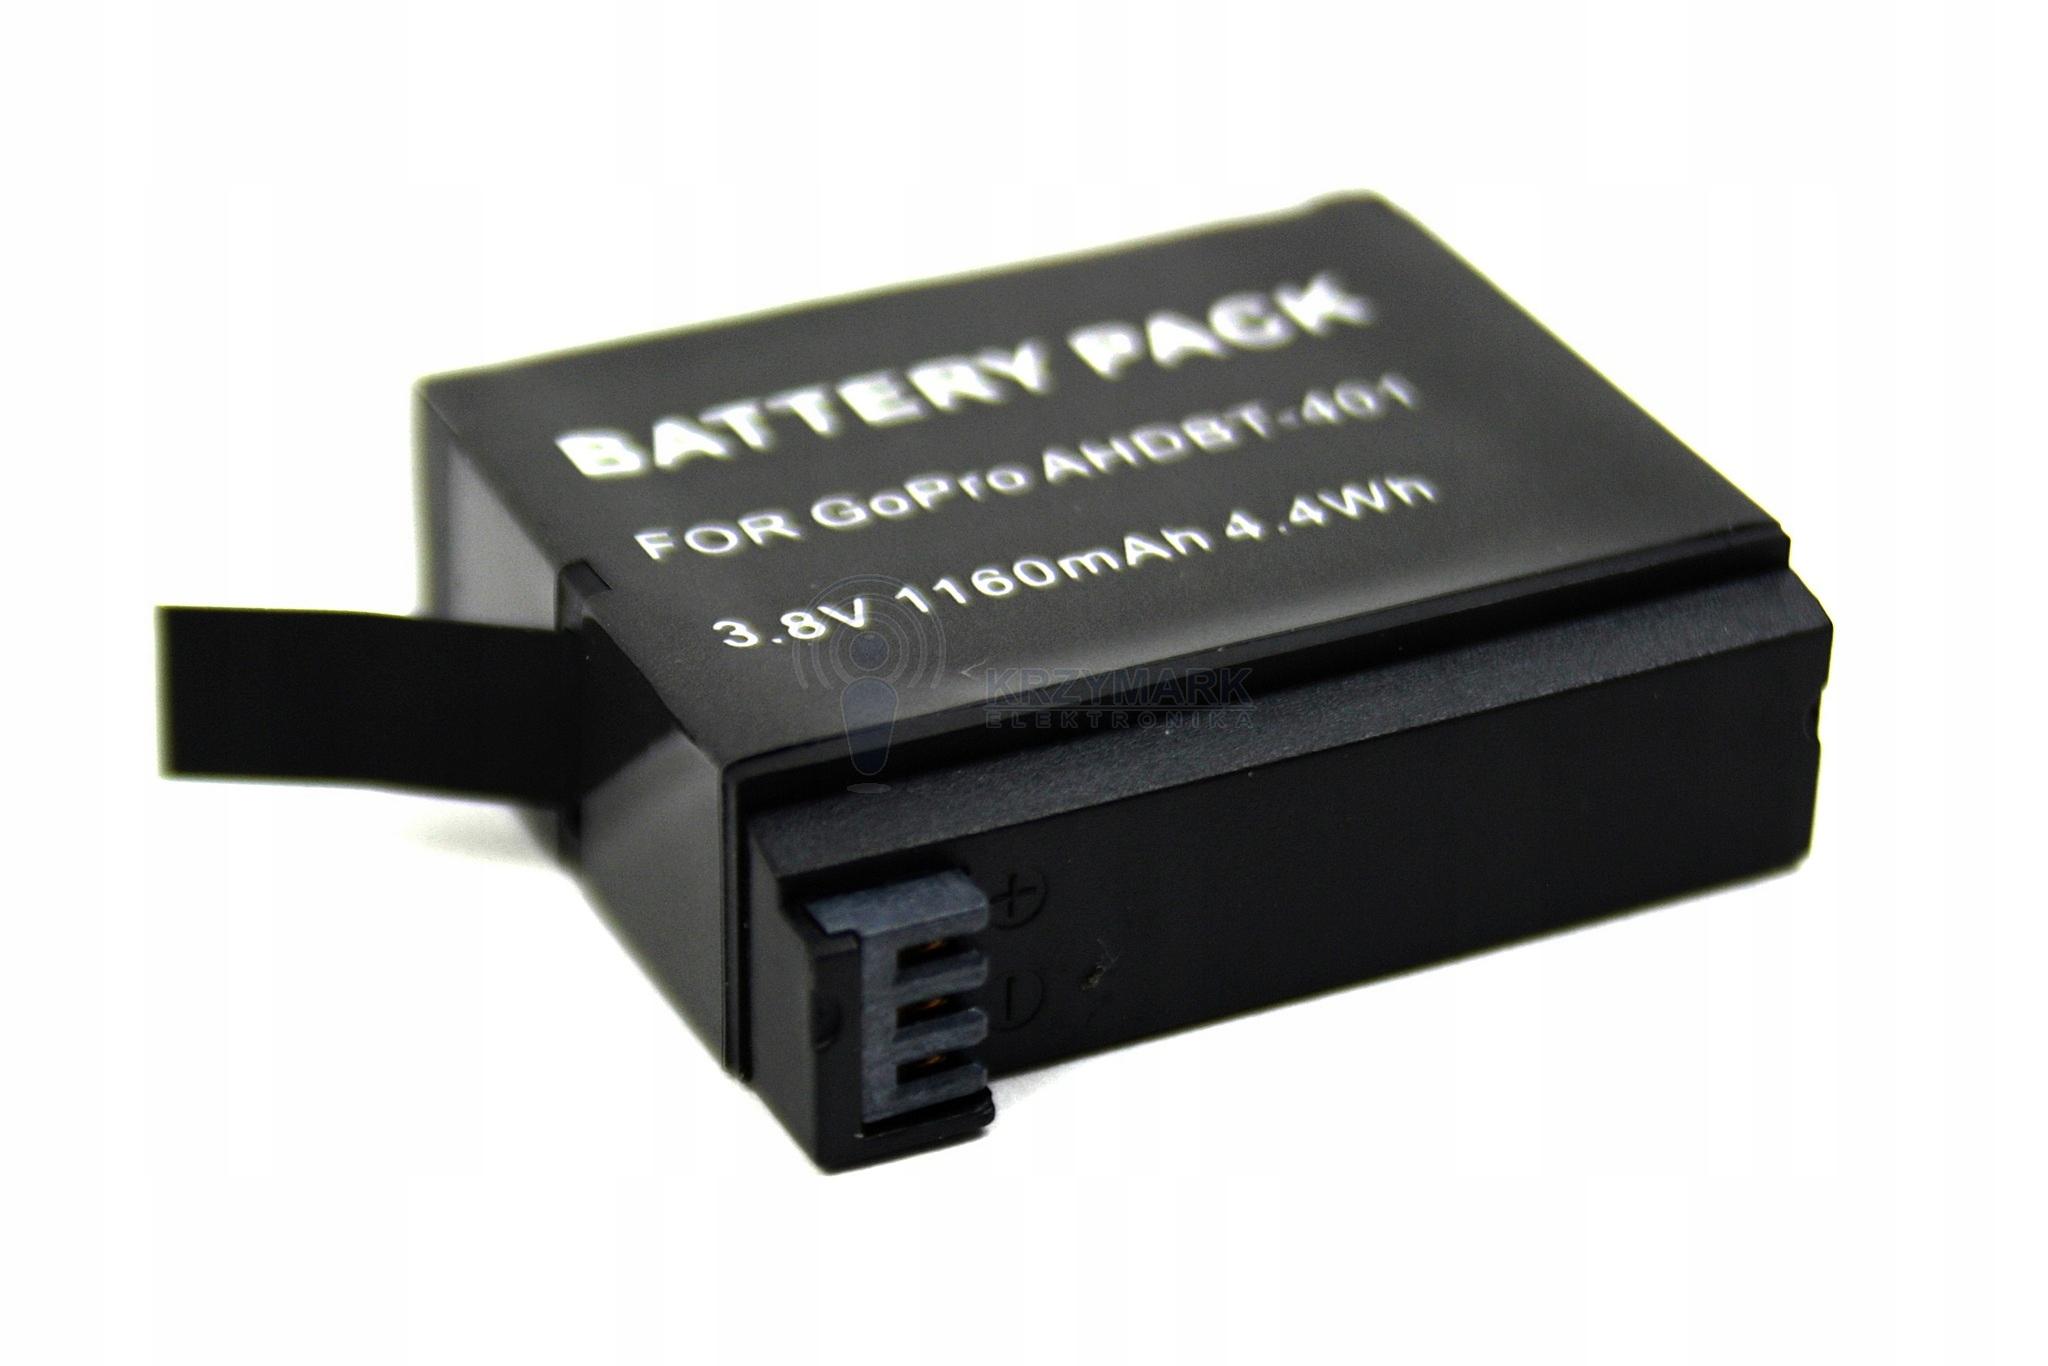 BATERIA AKUMULATOR AHDBT-401 GOPRO GO PRO HERO 4 - Baterie do aparatów cyfrowych